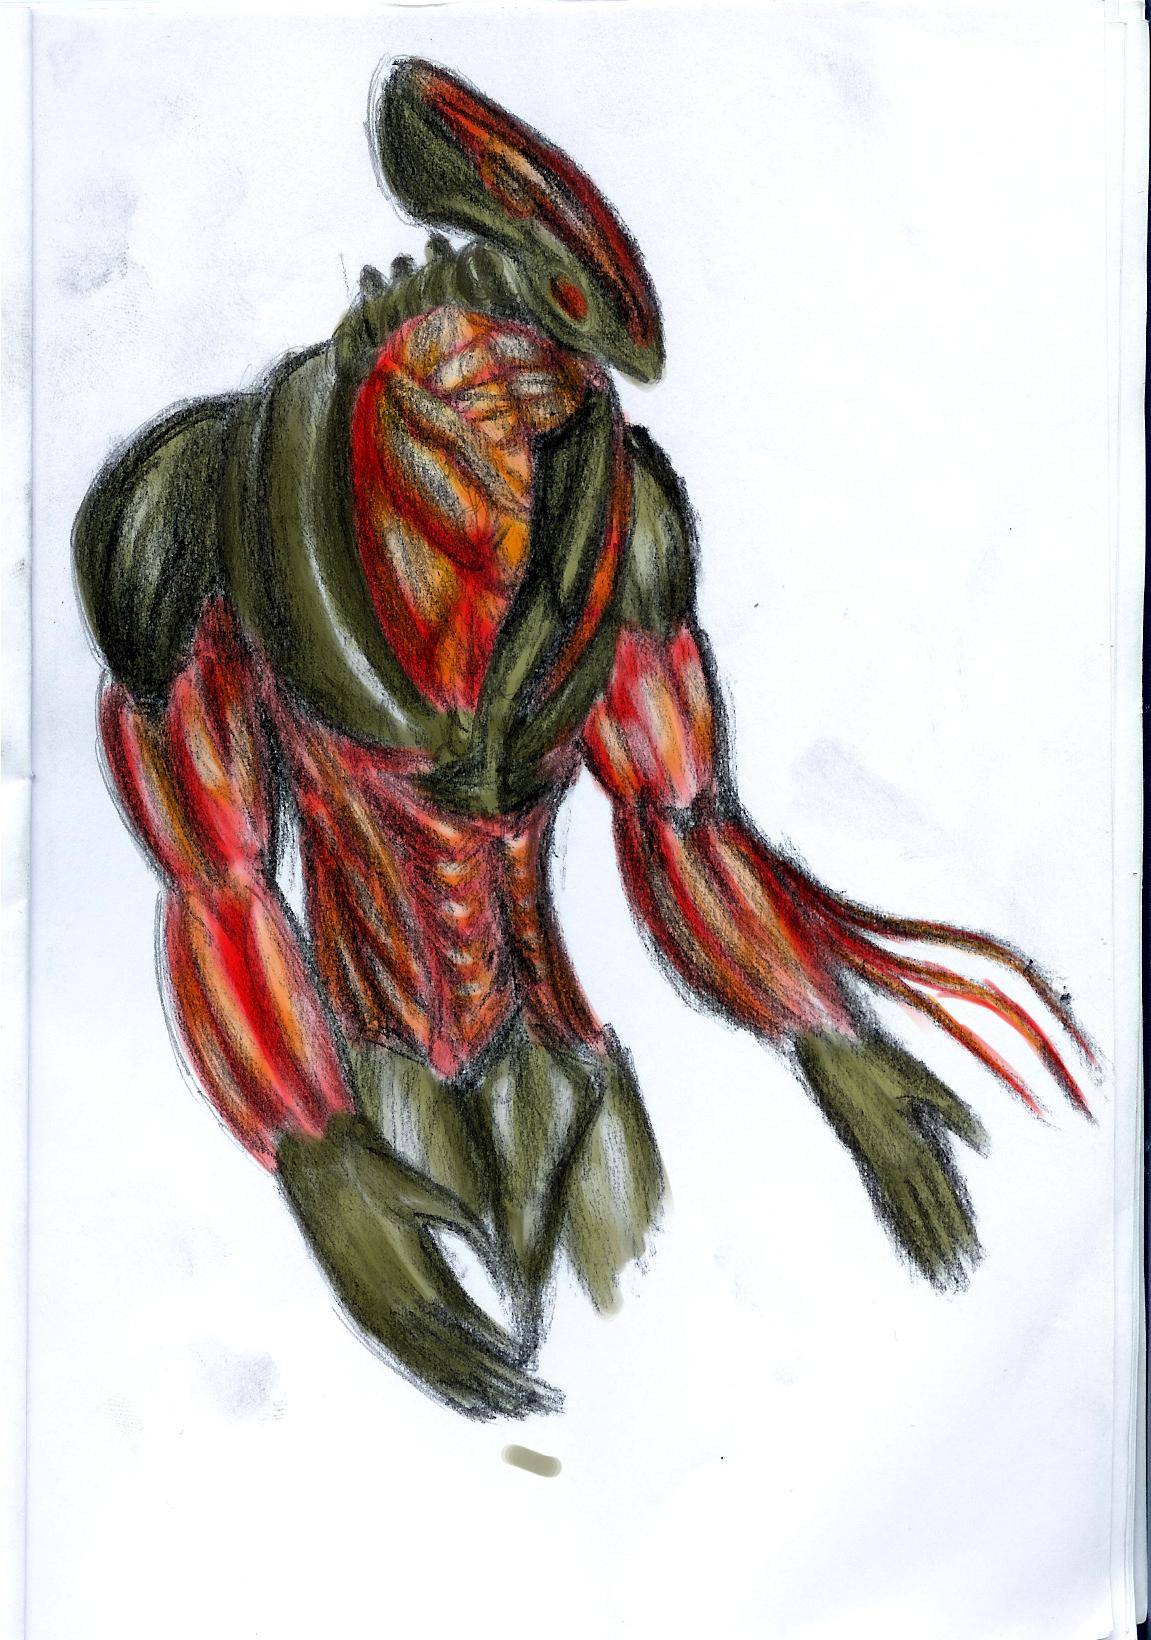 Mutant 97